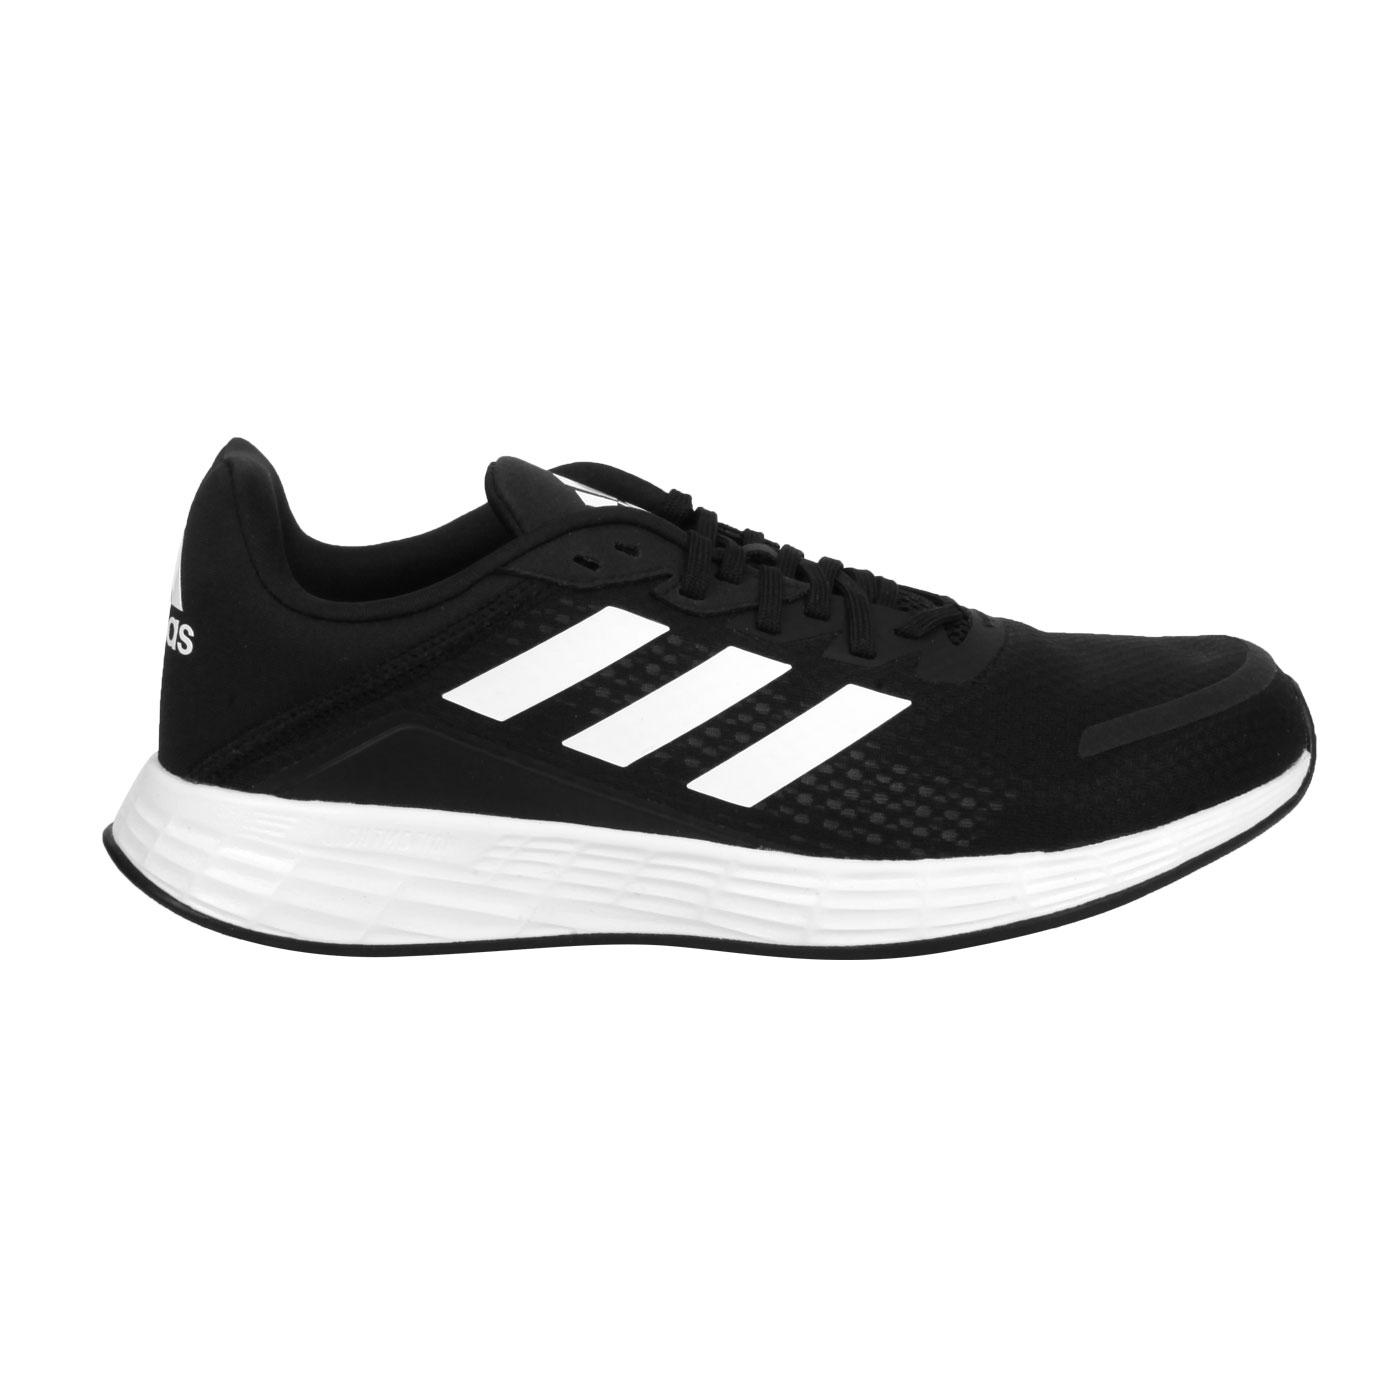 ADIDAS 男款休閒運動鞋  @DURAMO SL@GV7124